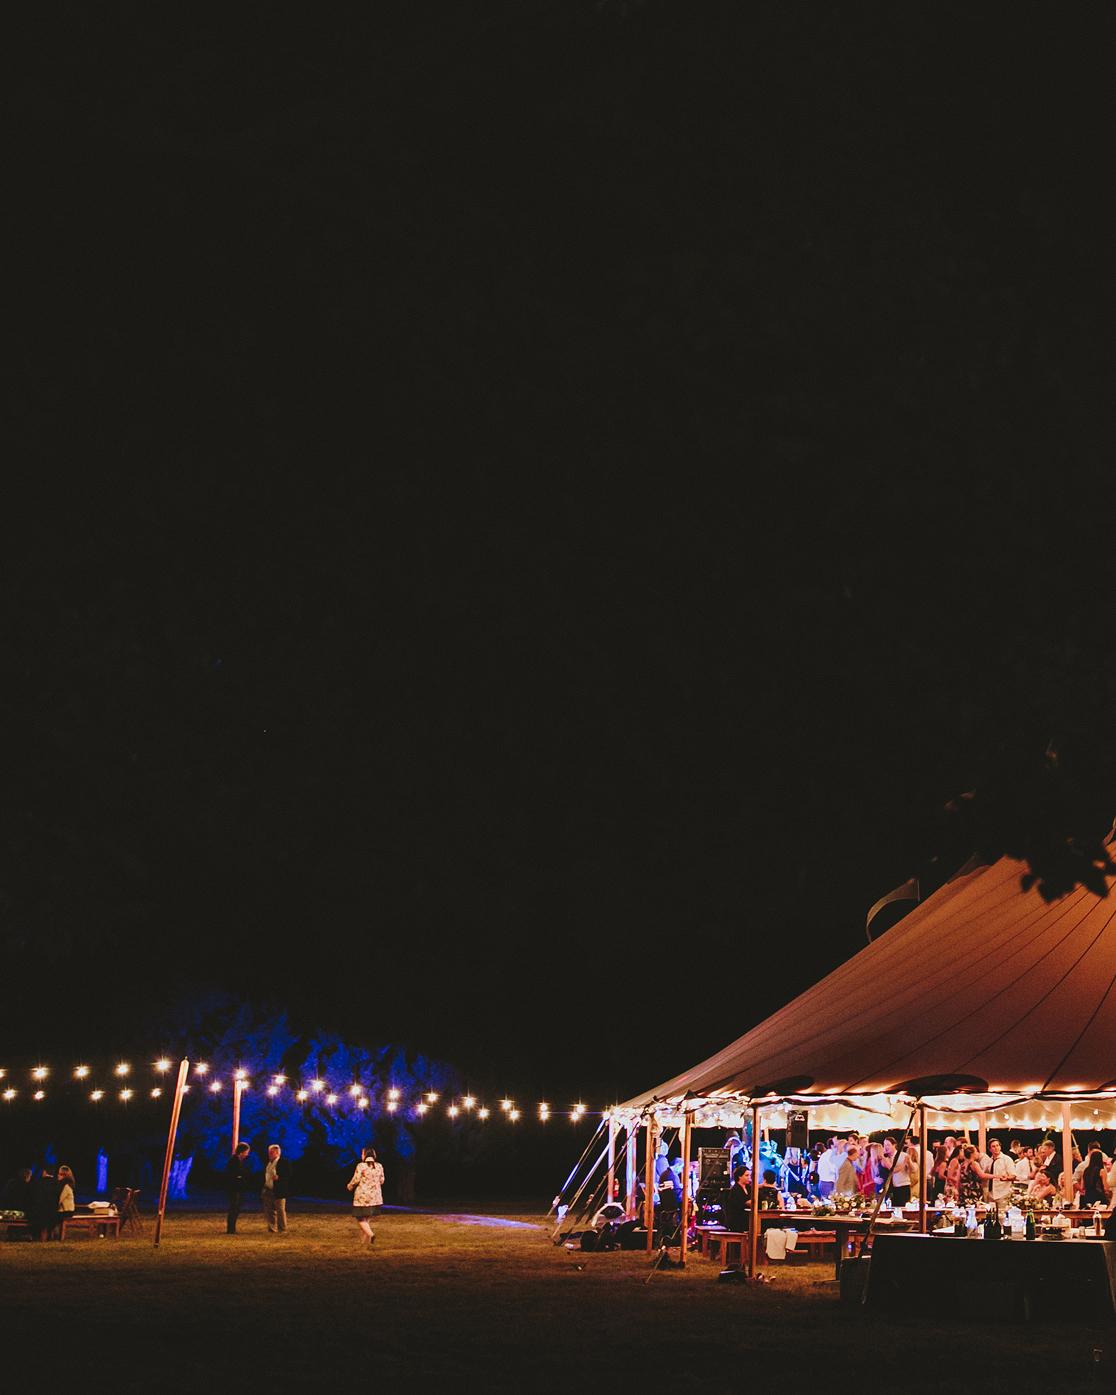 hadley corey wedding tent exterior night lights